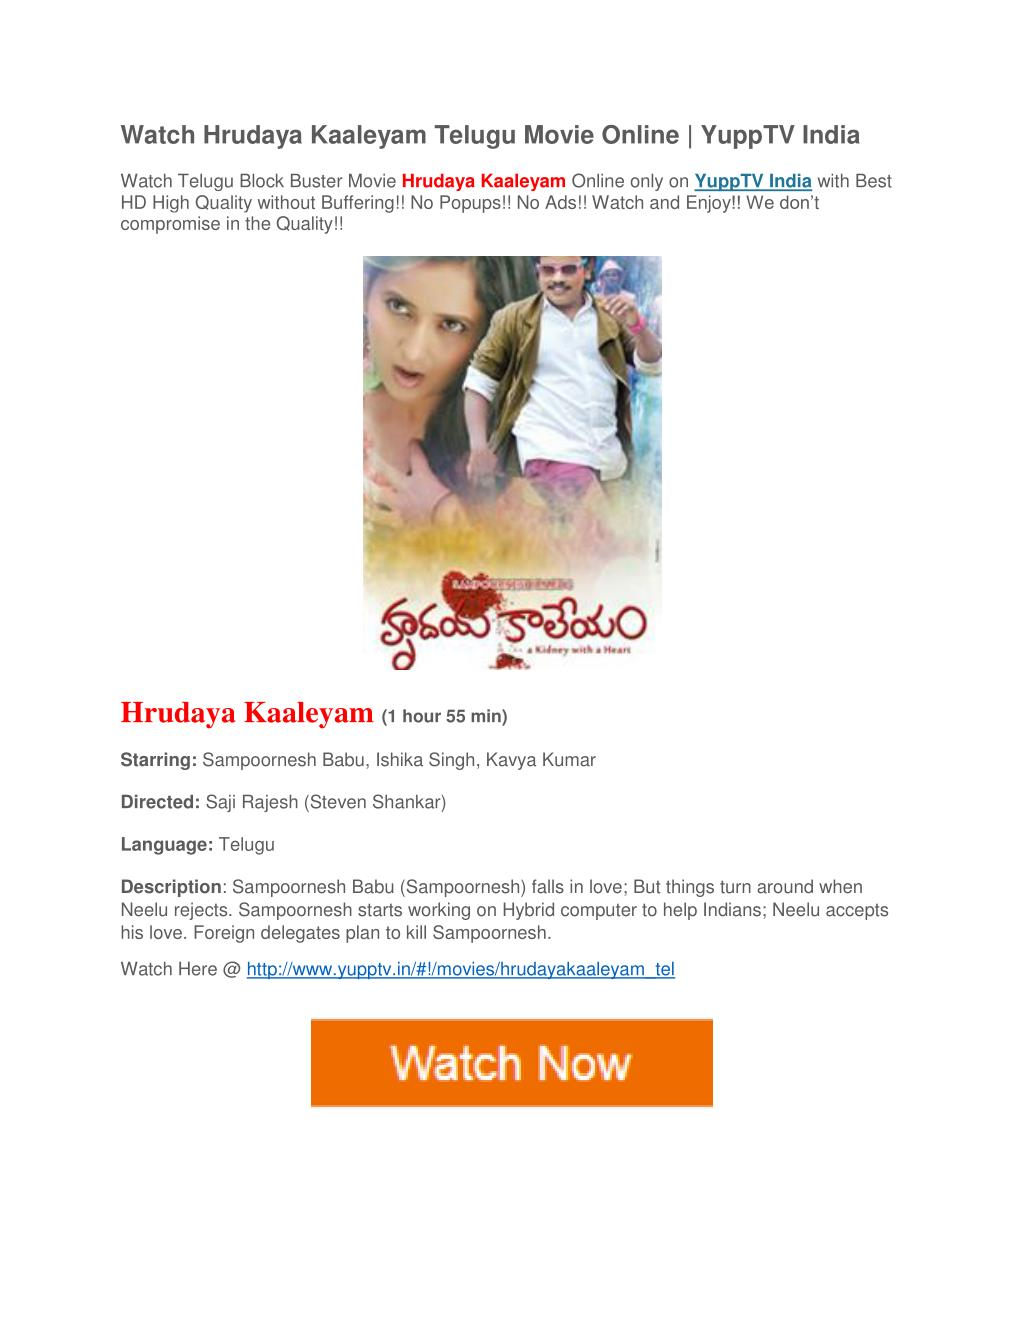 PPT - Watch Hrudaya Kaaleyam Movie online   YuppTV India